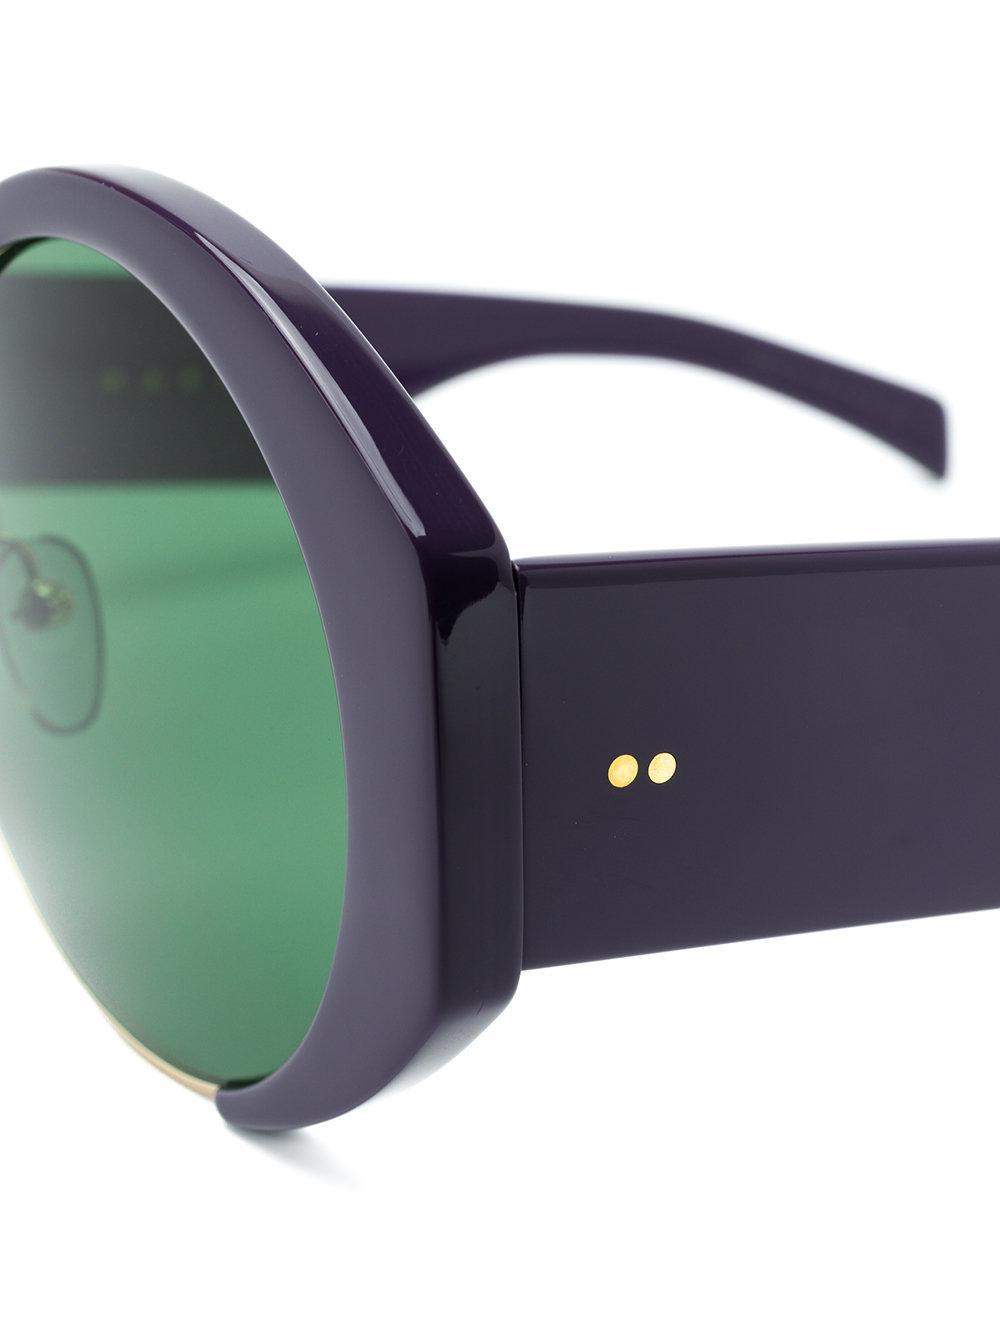 8d31ce61f941 Marni Eyewear Green Tinted Sunglasses in Green - Lyst